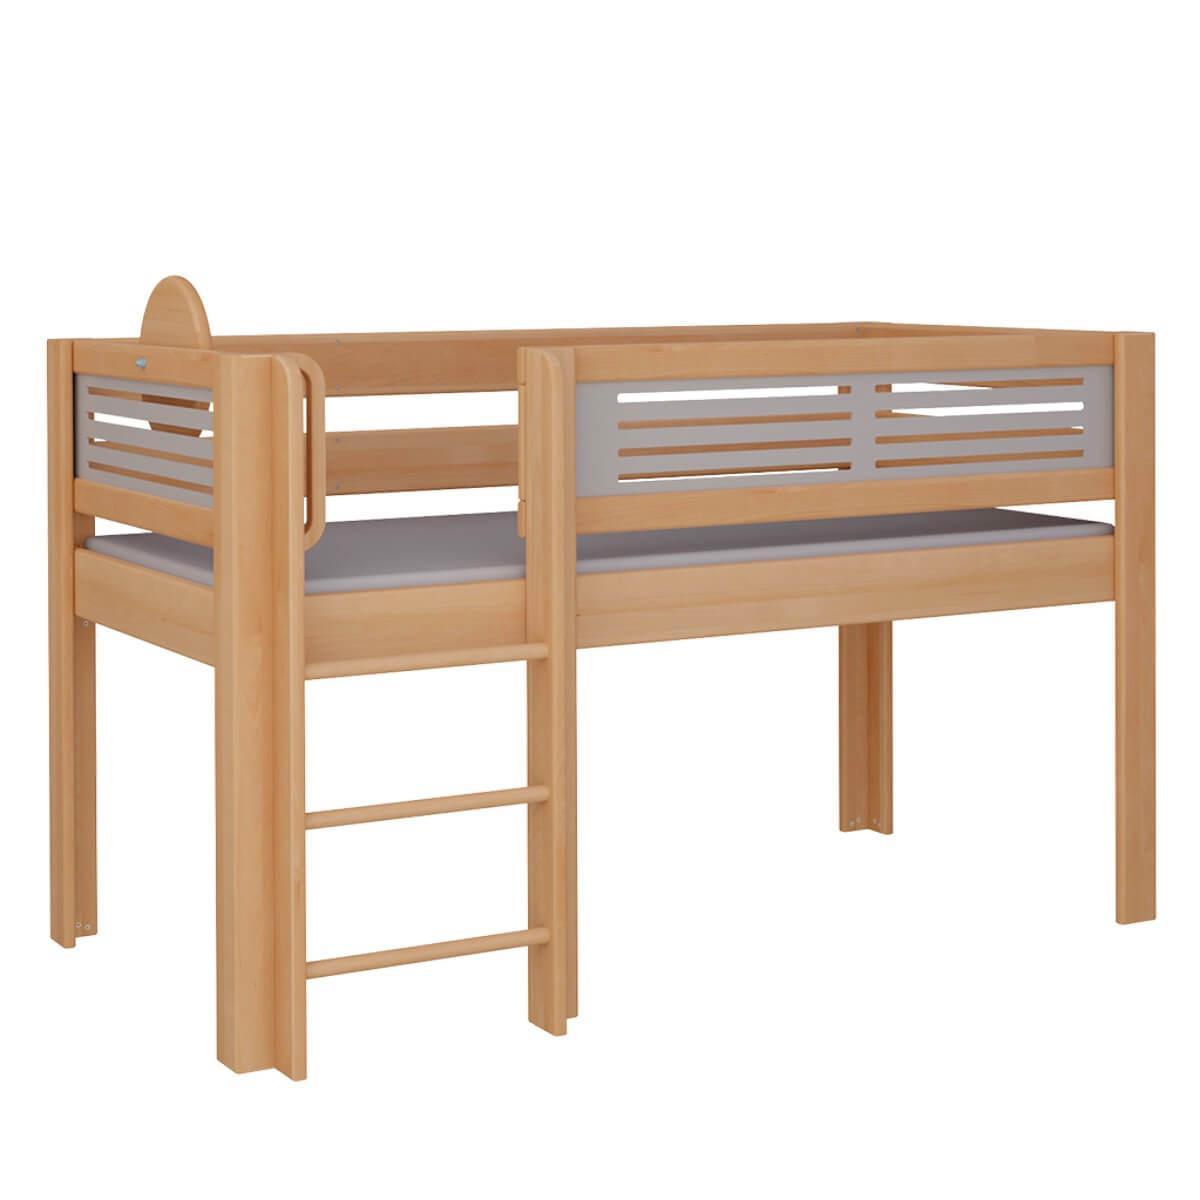 Tatü halbhohes Bett mit Leiter DELUXE De Breuyn natur geölt Füllungen grau